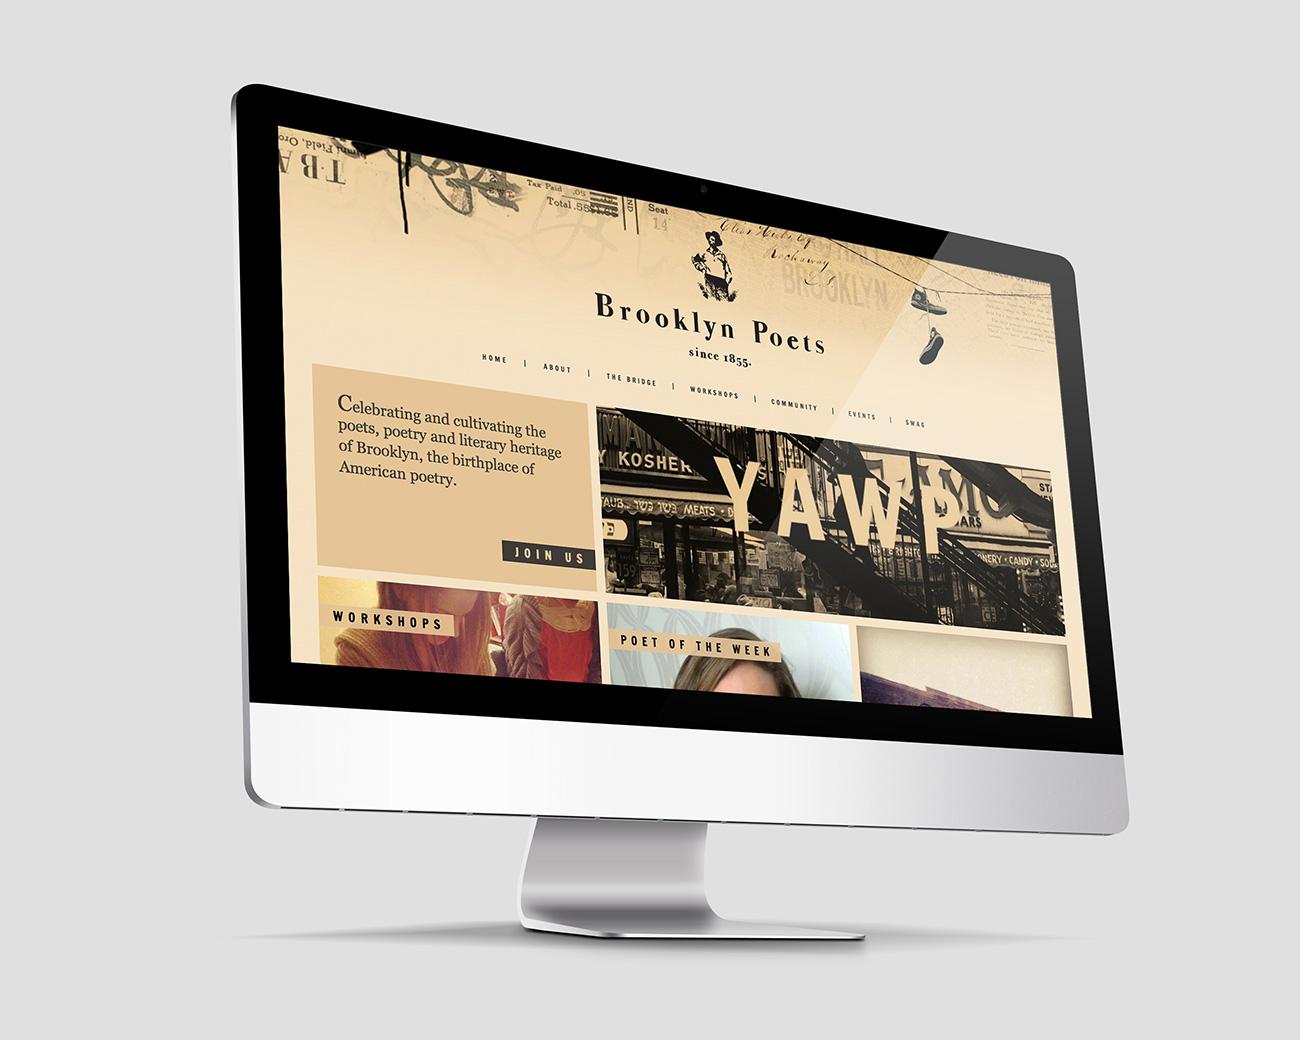 Brooklyn Poets Badass Website Header Designed by Worstofall Design